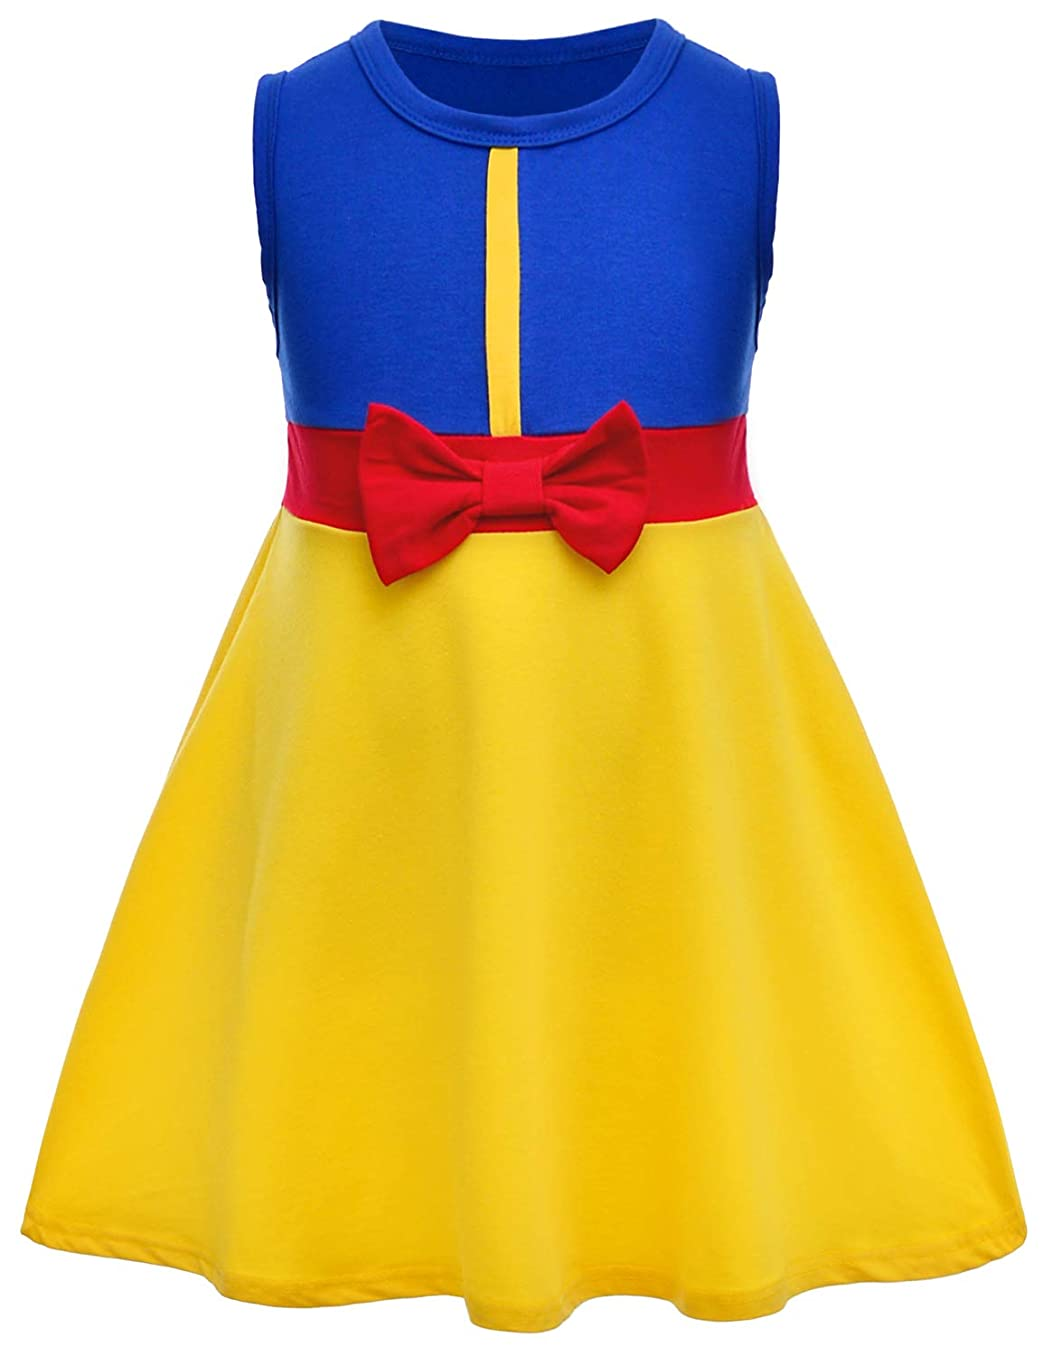 Joy Join Little Girls Mermaid Green Dress Halloween Cosplay Costumes for Toddler Girls (12M-6Years)